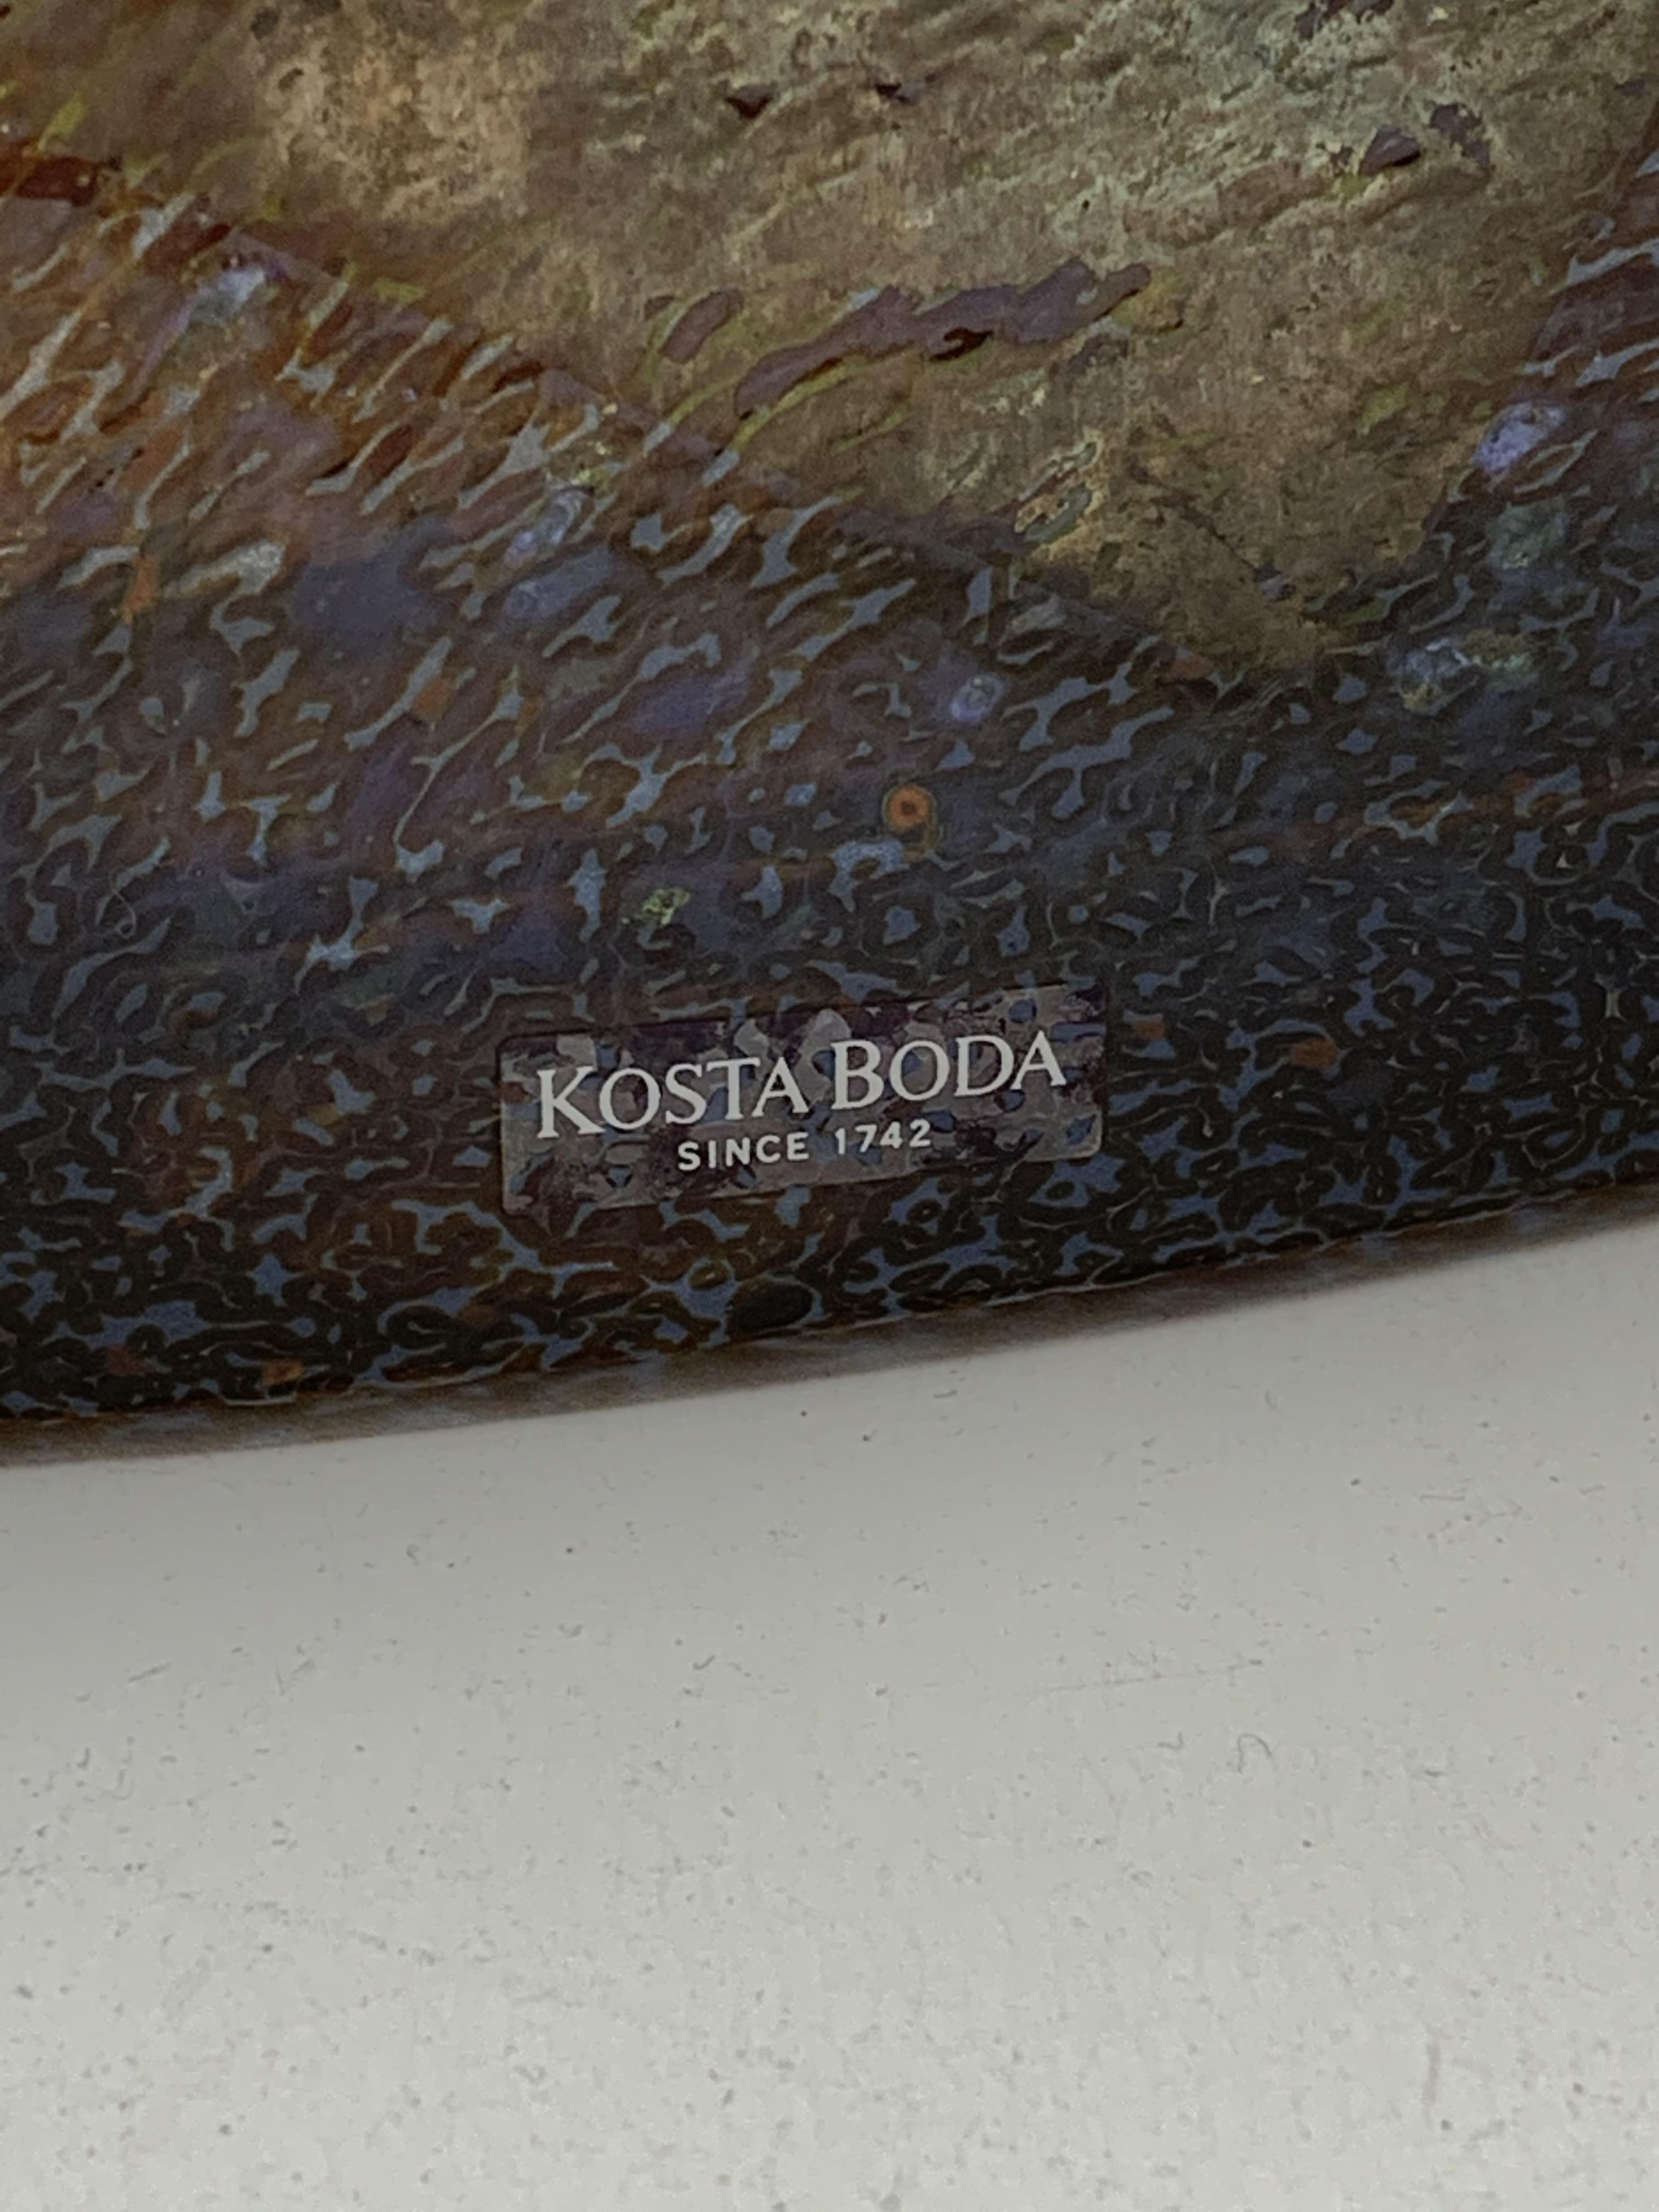 Bertil Vallien - Kosta Boda, satellite glass vase of compressed square form with bottle neck, with - Image 5 of 7